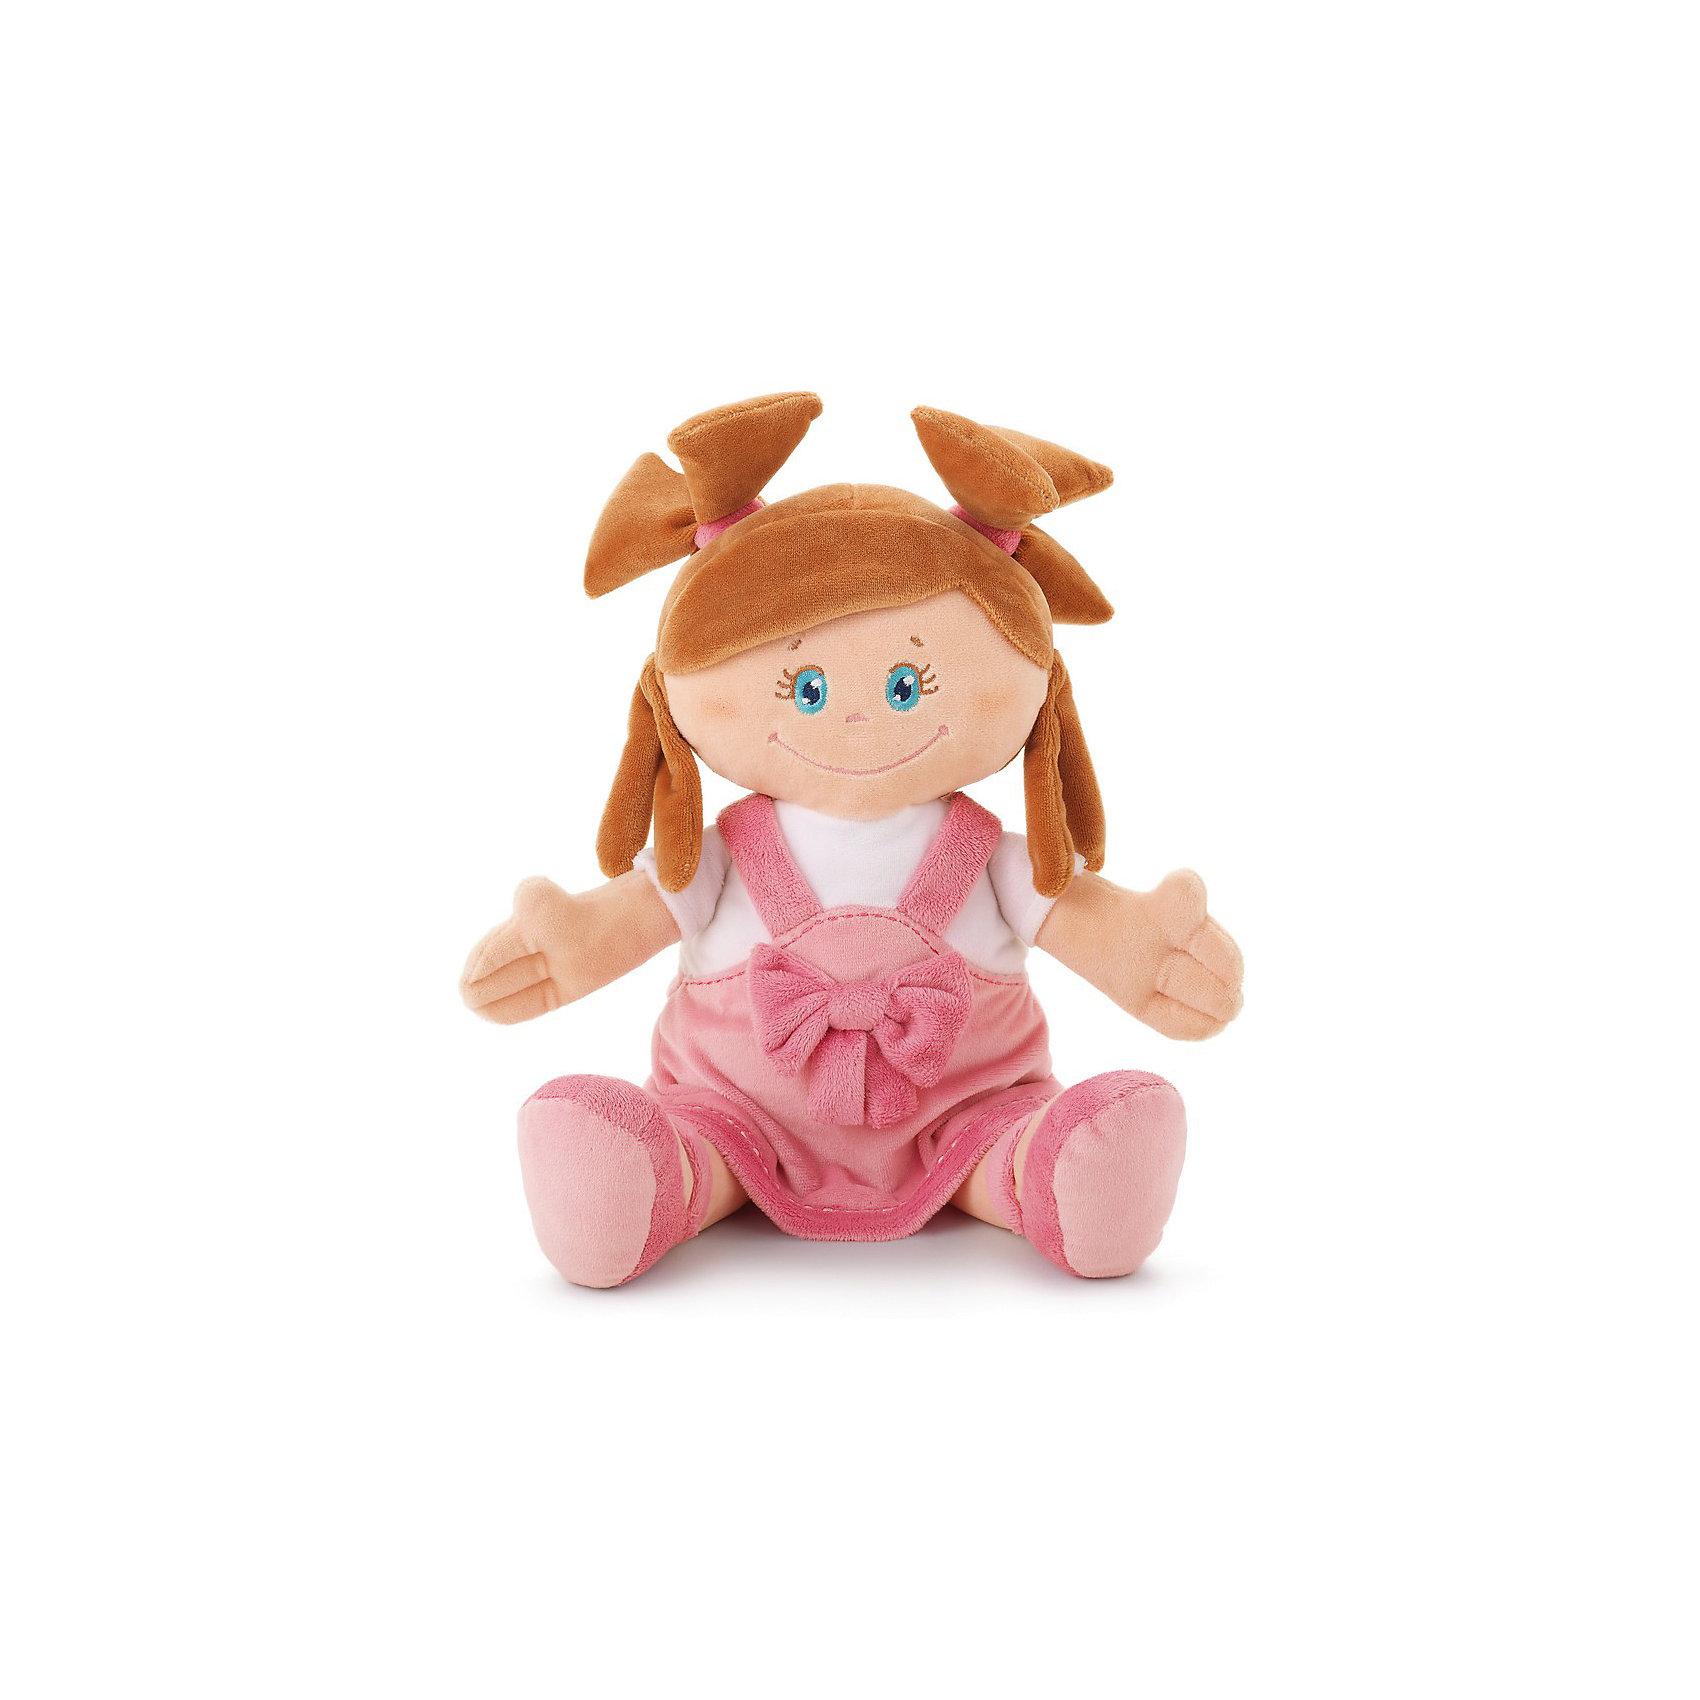 Trudi Мягкая кукла в платье с бантом, 40 см, Trudi мягкие игрушки trudi лайка маркус 34 см